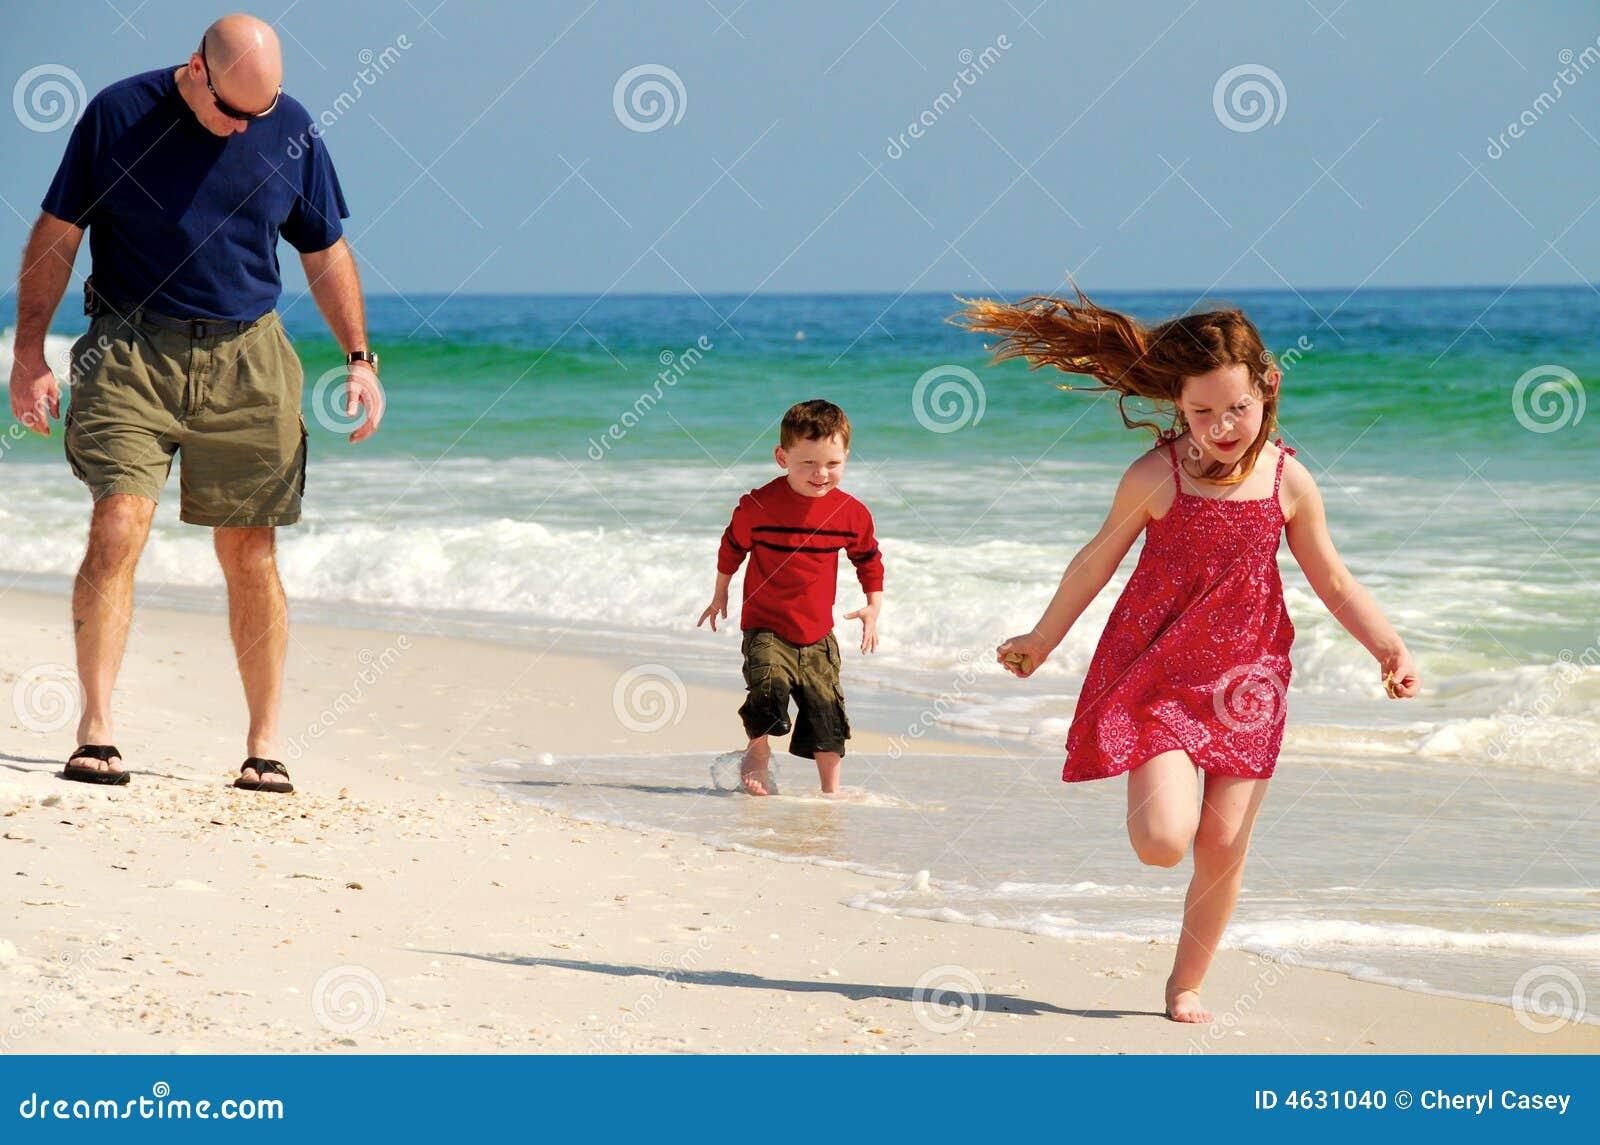 Divertimento da família na praia